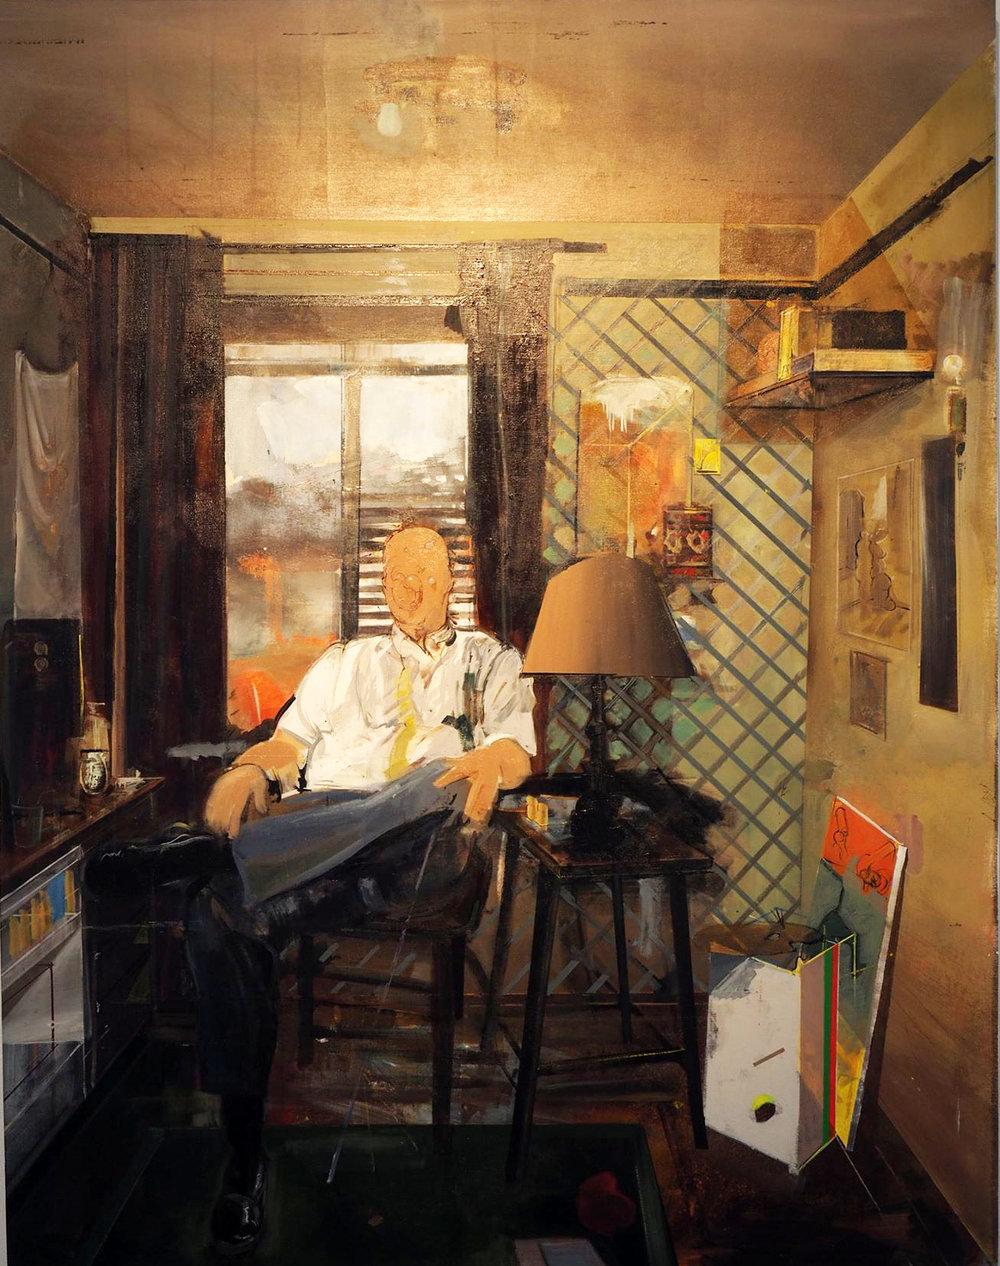 Robert Weiss,  Portrait of Ryan , acrylic on linen, 18 1/2 x 24 inches